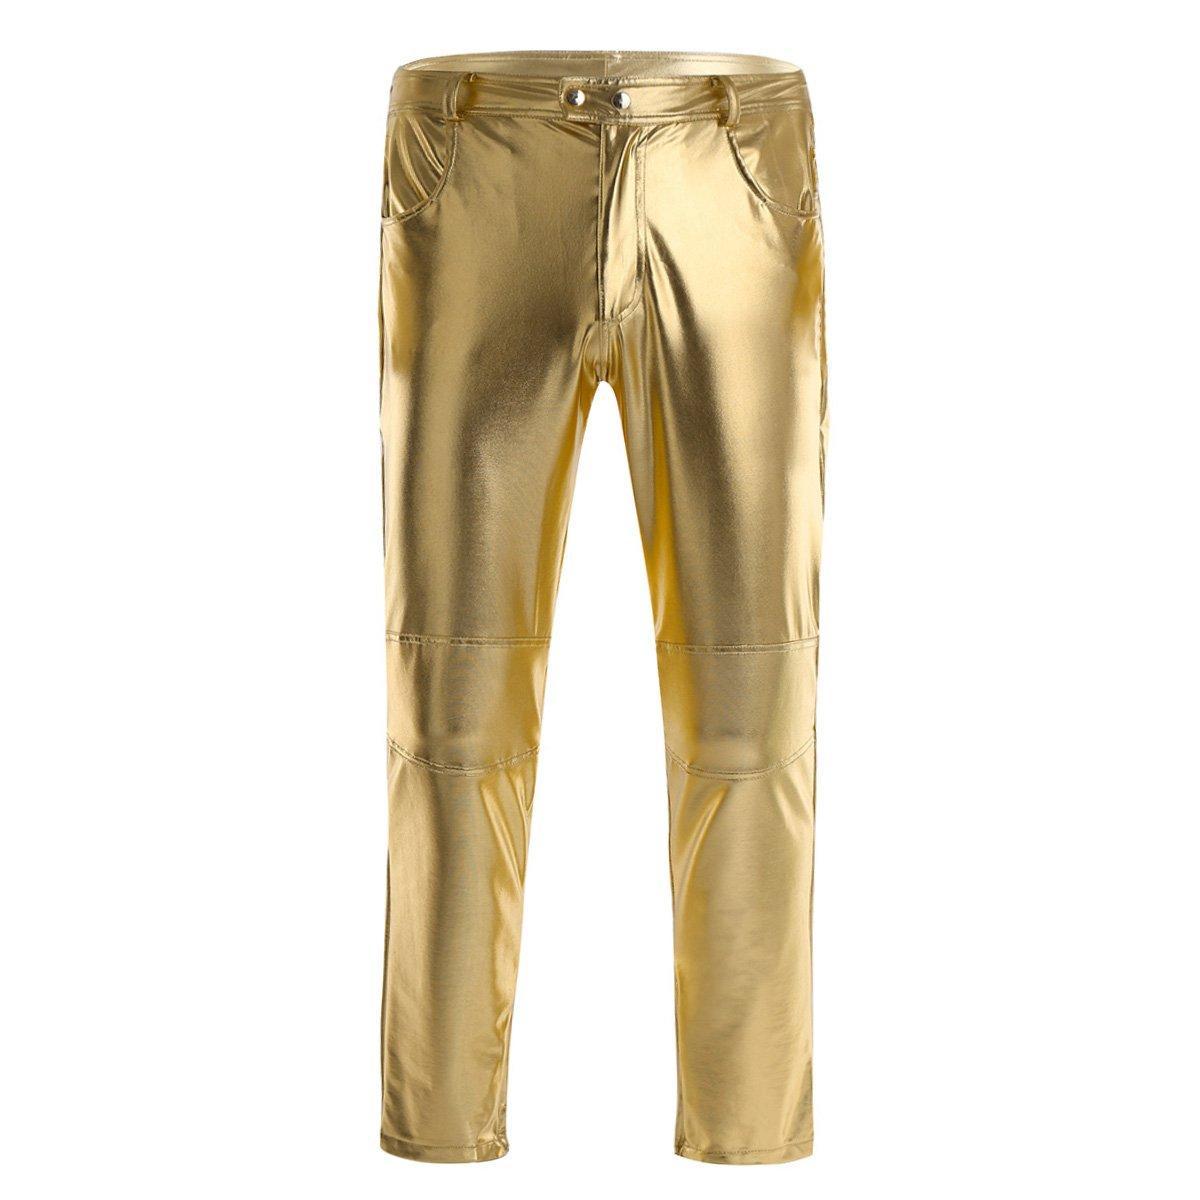 CHICTRY Men's Metallic Shiny Pants PVC Leather Skinny Biker Leggings Long Trousers